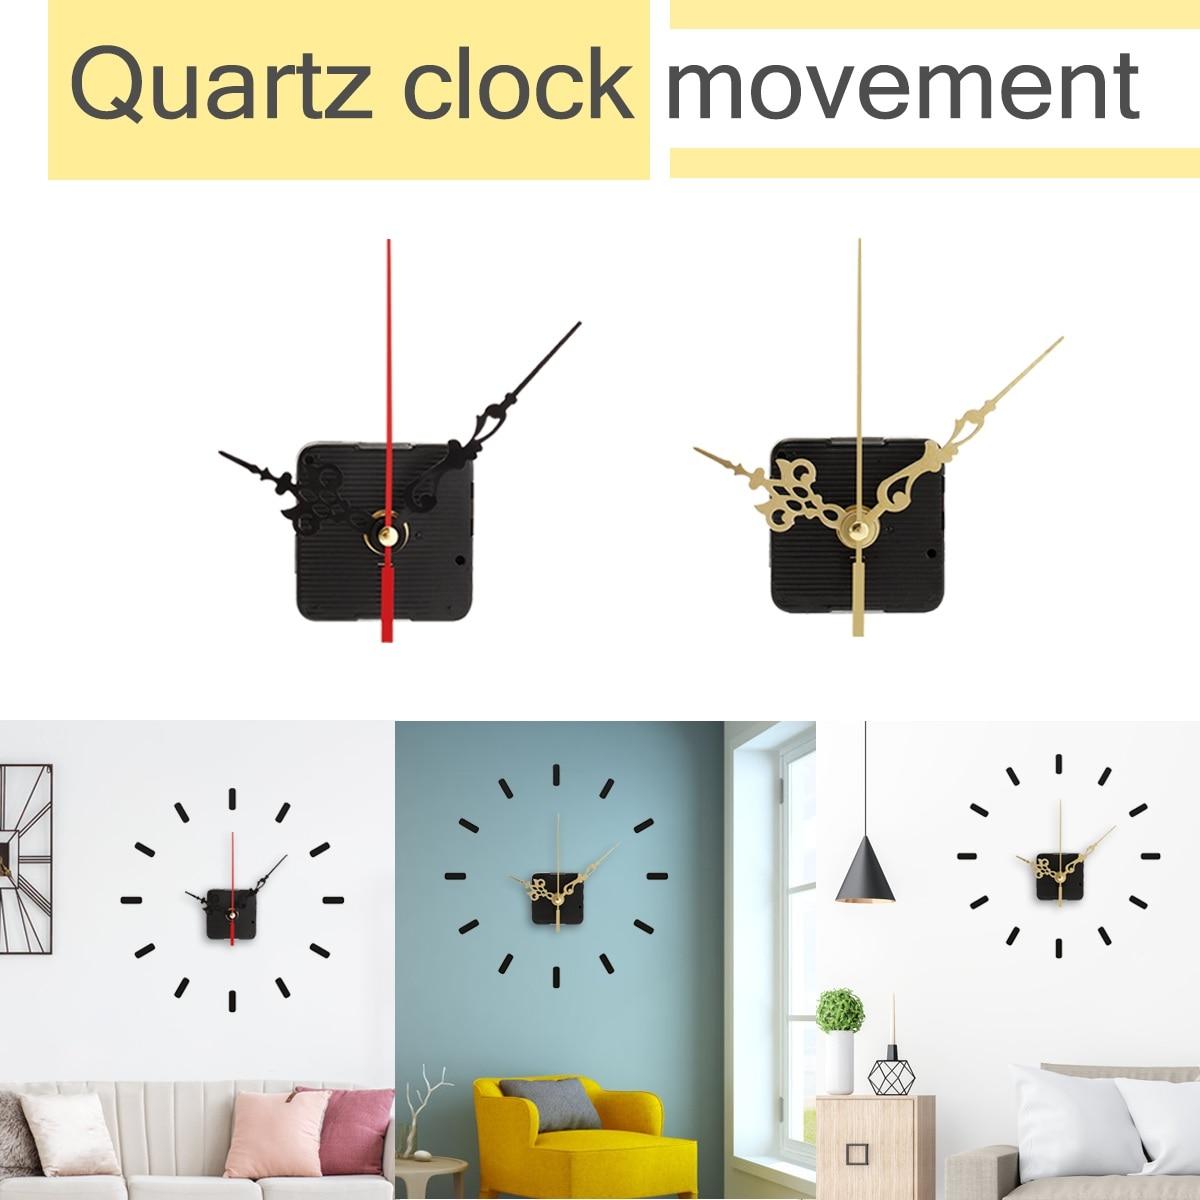 122x92x65mm DIY Silent Quartz Clock Movement Mechanism Hands Wall Repair Tool Parts Kit Set Scanning Cross Stitch Accessories